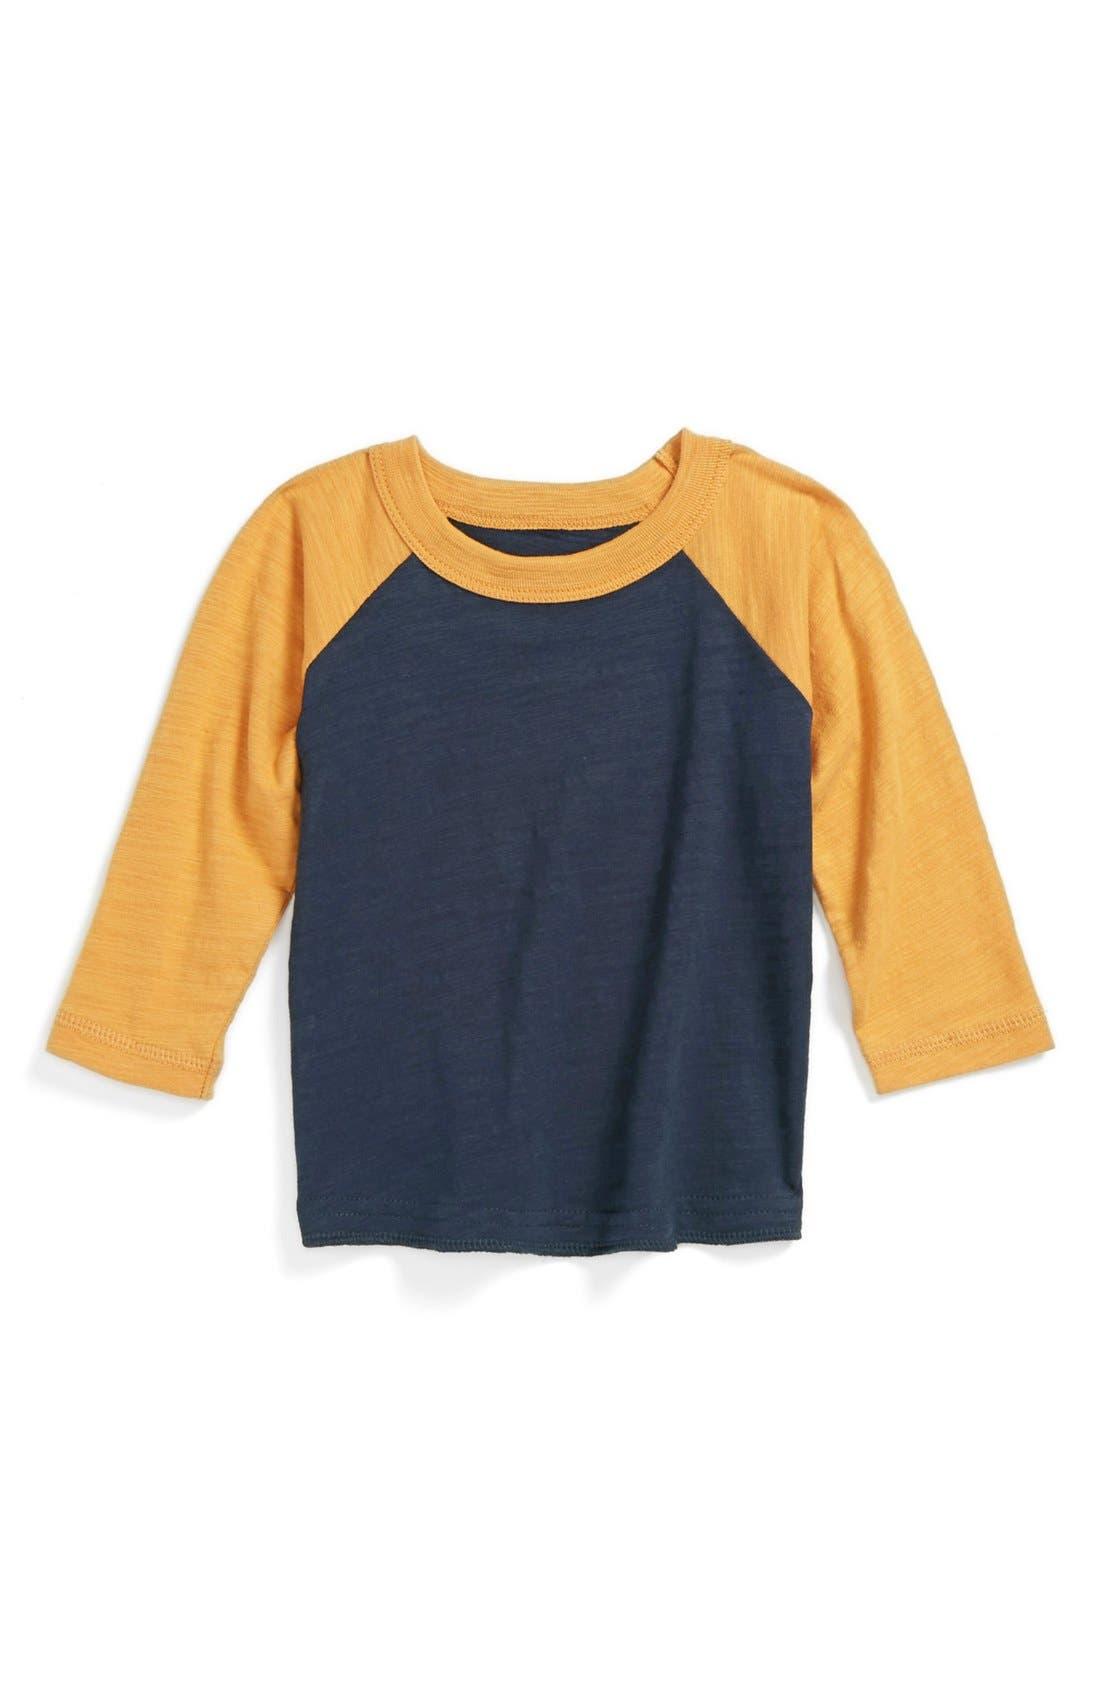 Alternate Image 1 Selected - Peek 'Field' Long Sleeve T-Shirt (Baby Boys)